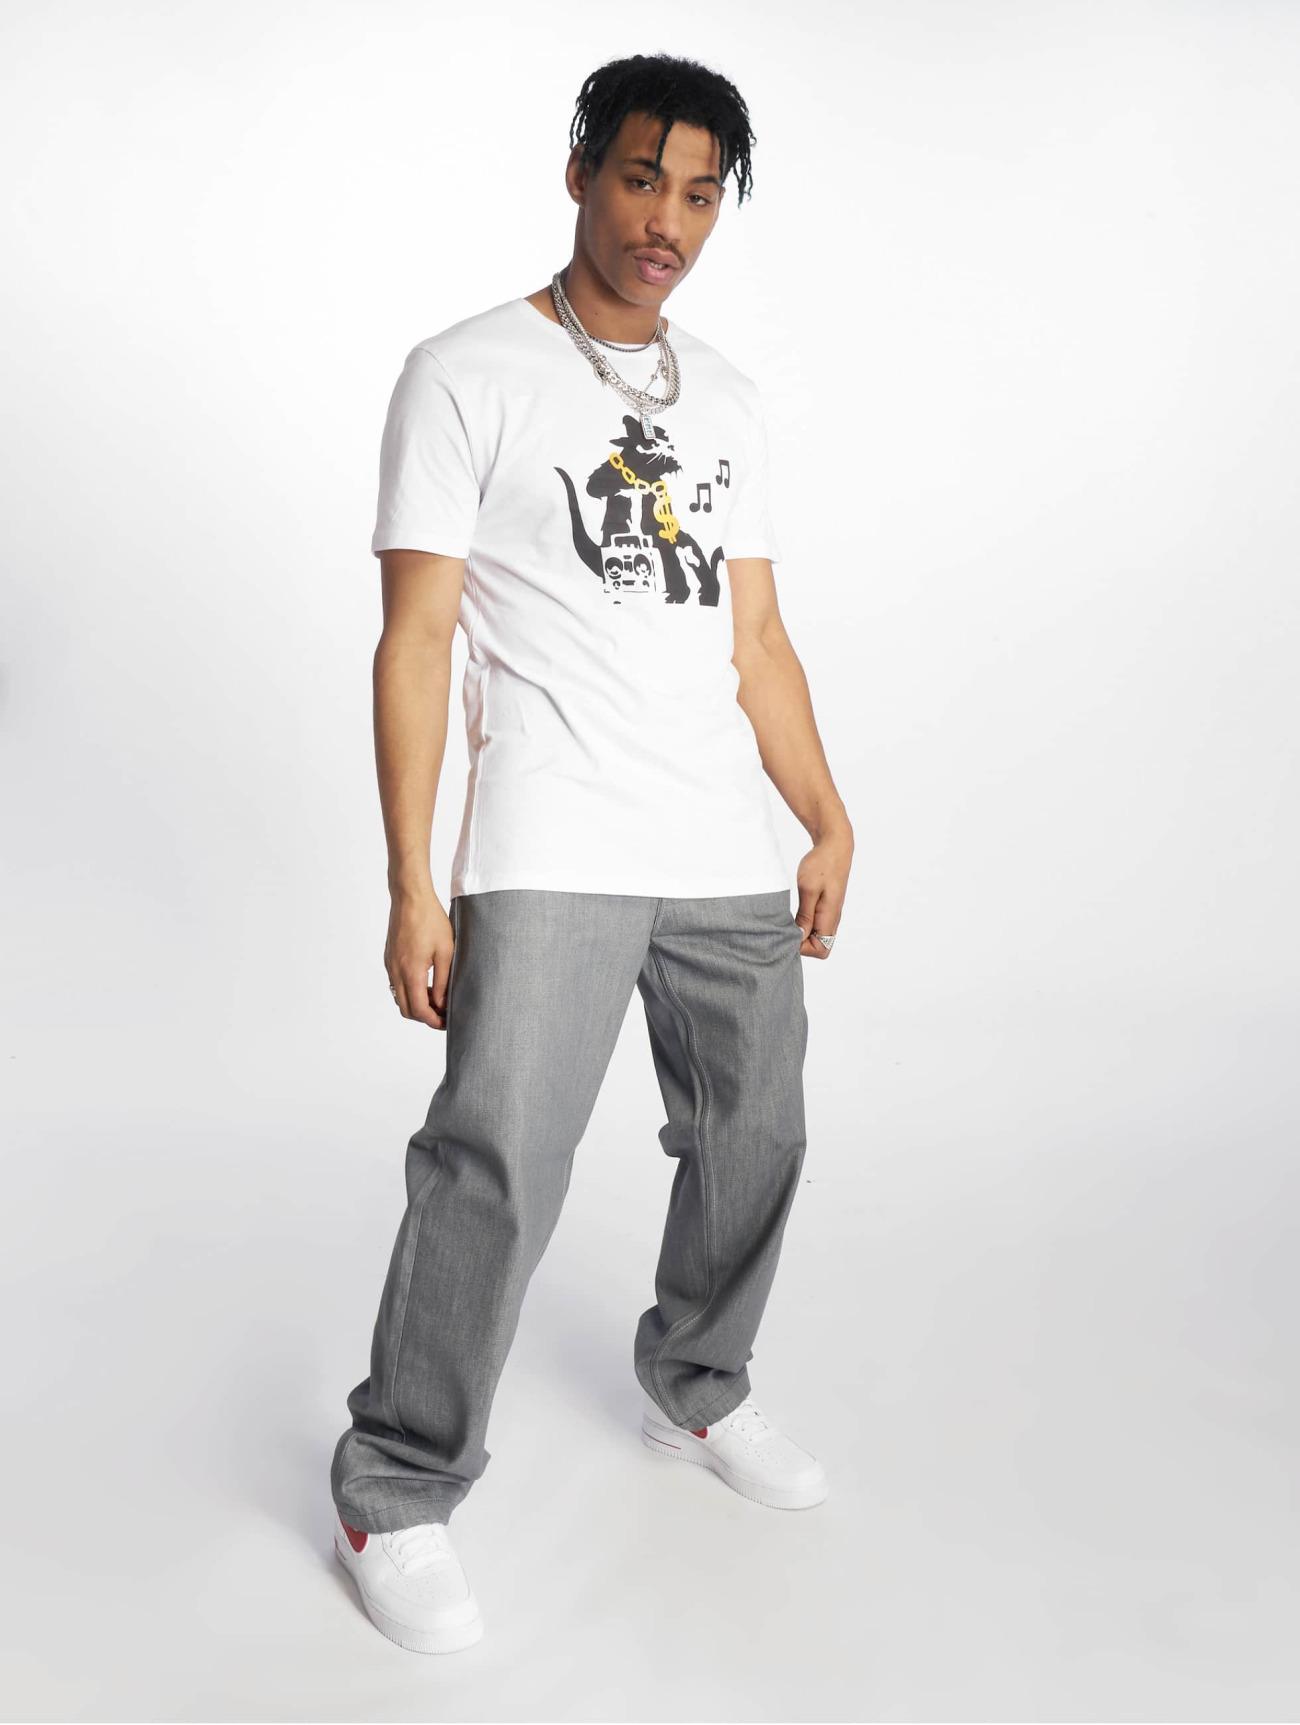 Merchcode Överdel / T-shirt Banksy Hiphop Rat i vit 619597 Män Överdelar